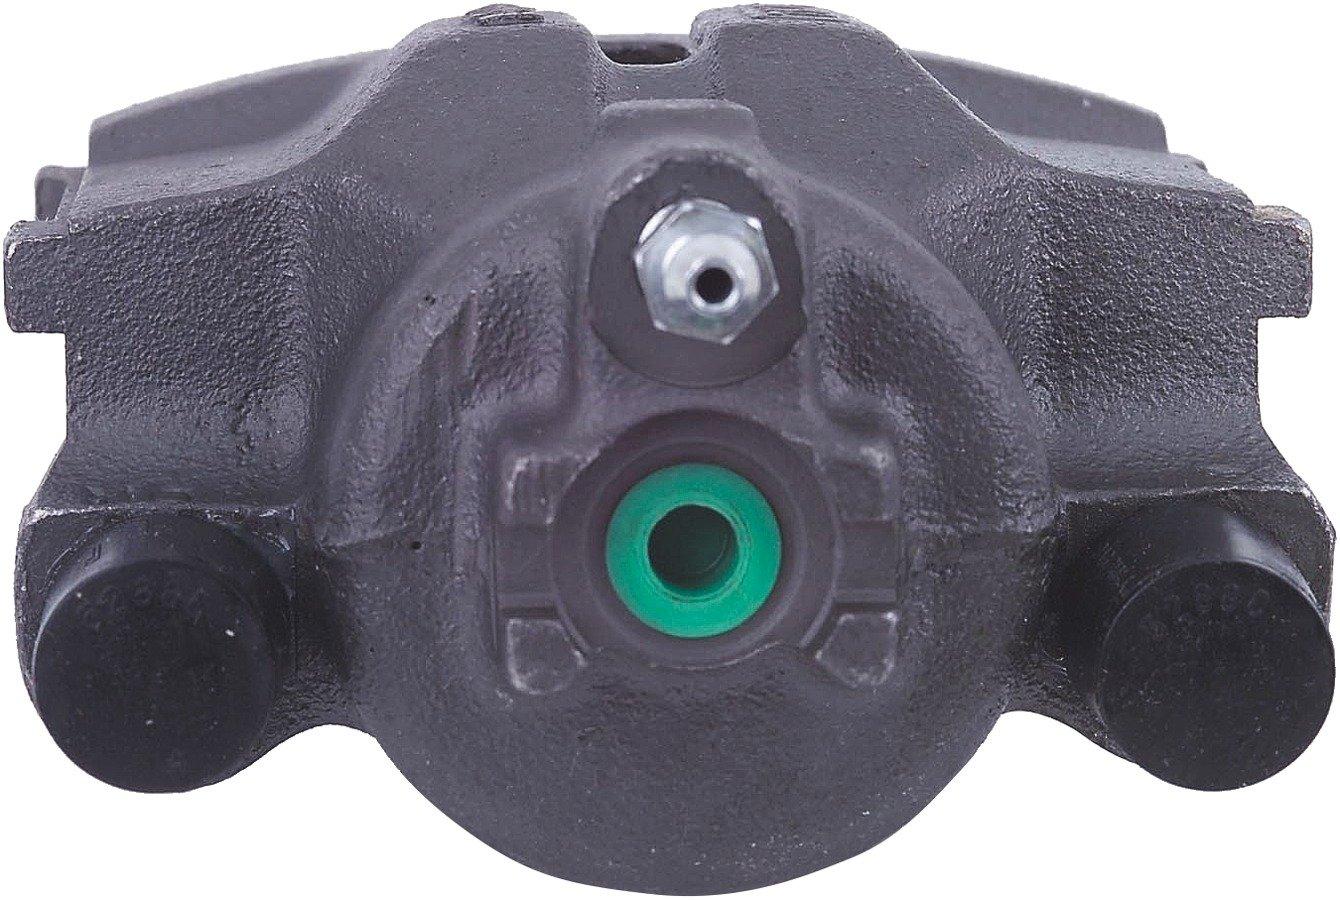 Cardone 19-1042 Remanufactured Import Friction Ready (Unloaded) Brake Caliper A1 Cardone